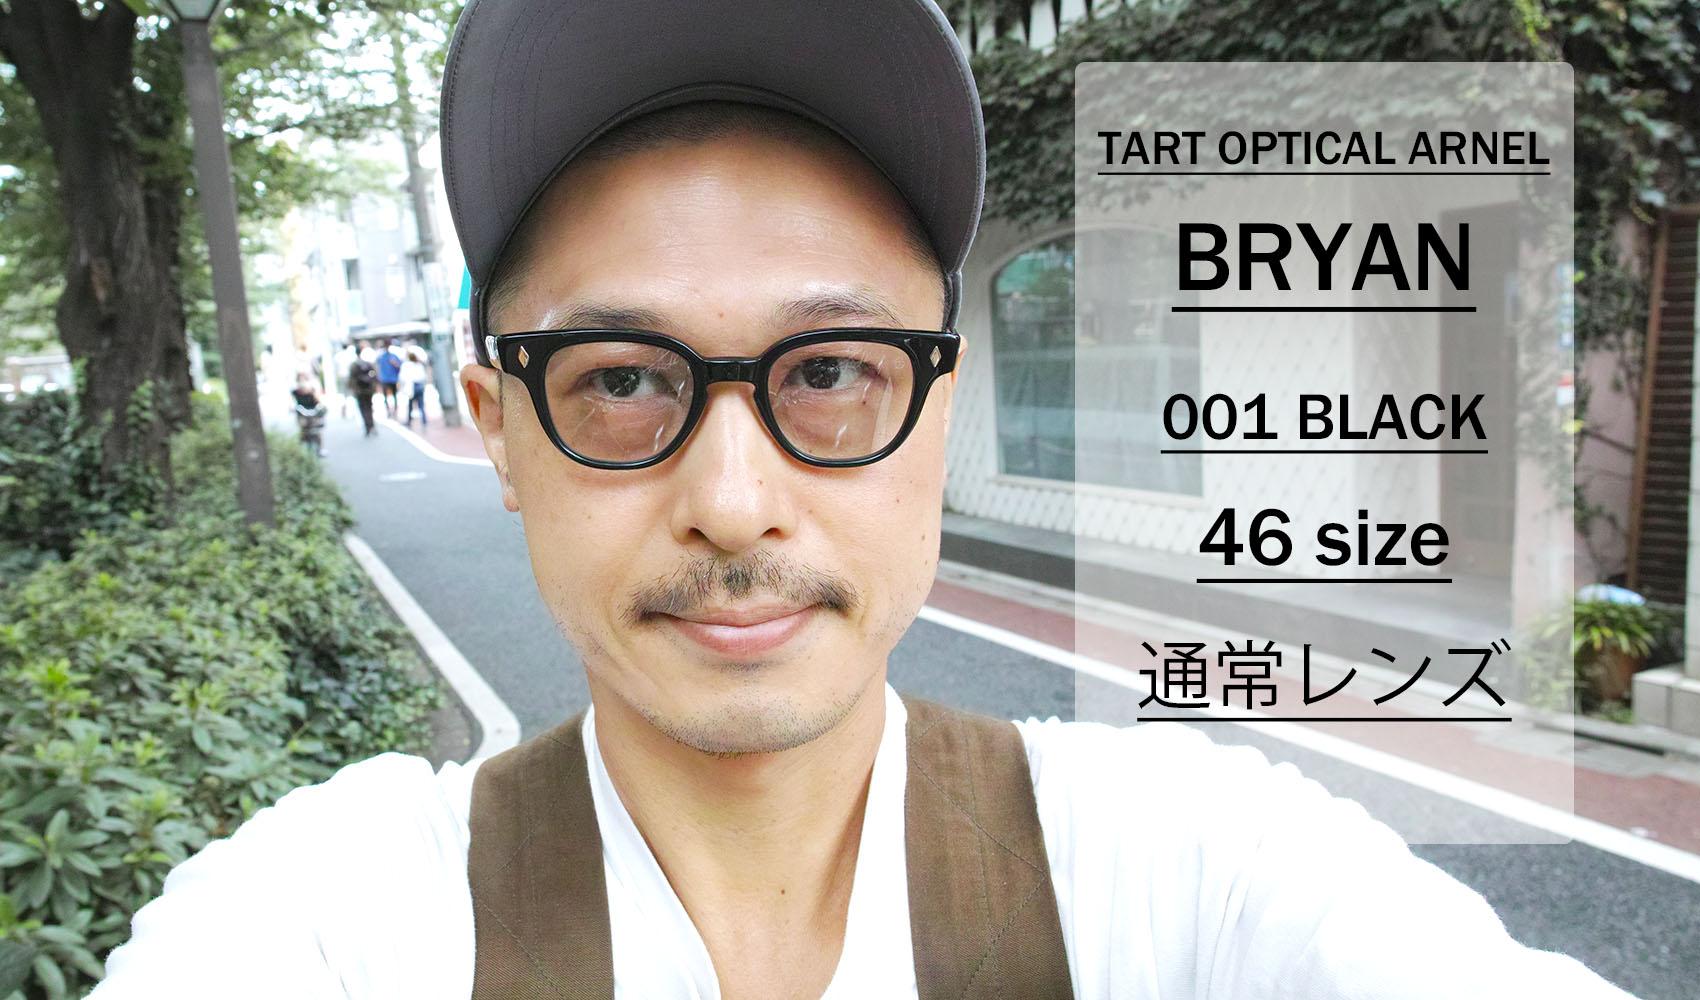 TART OPTICAL ARNEL / BRYAN / 001 Black / 46 size